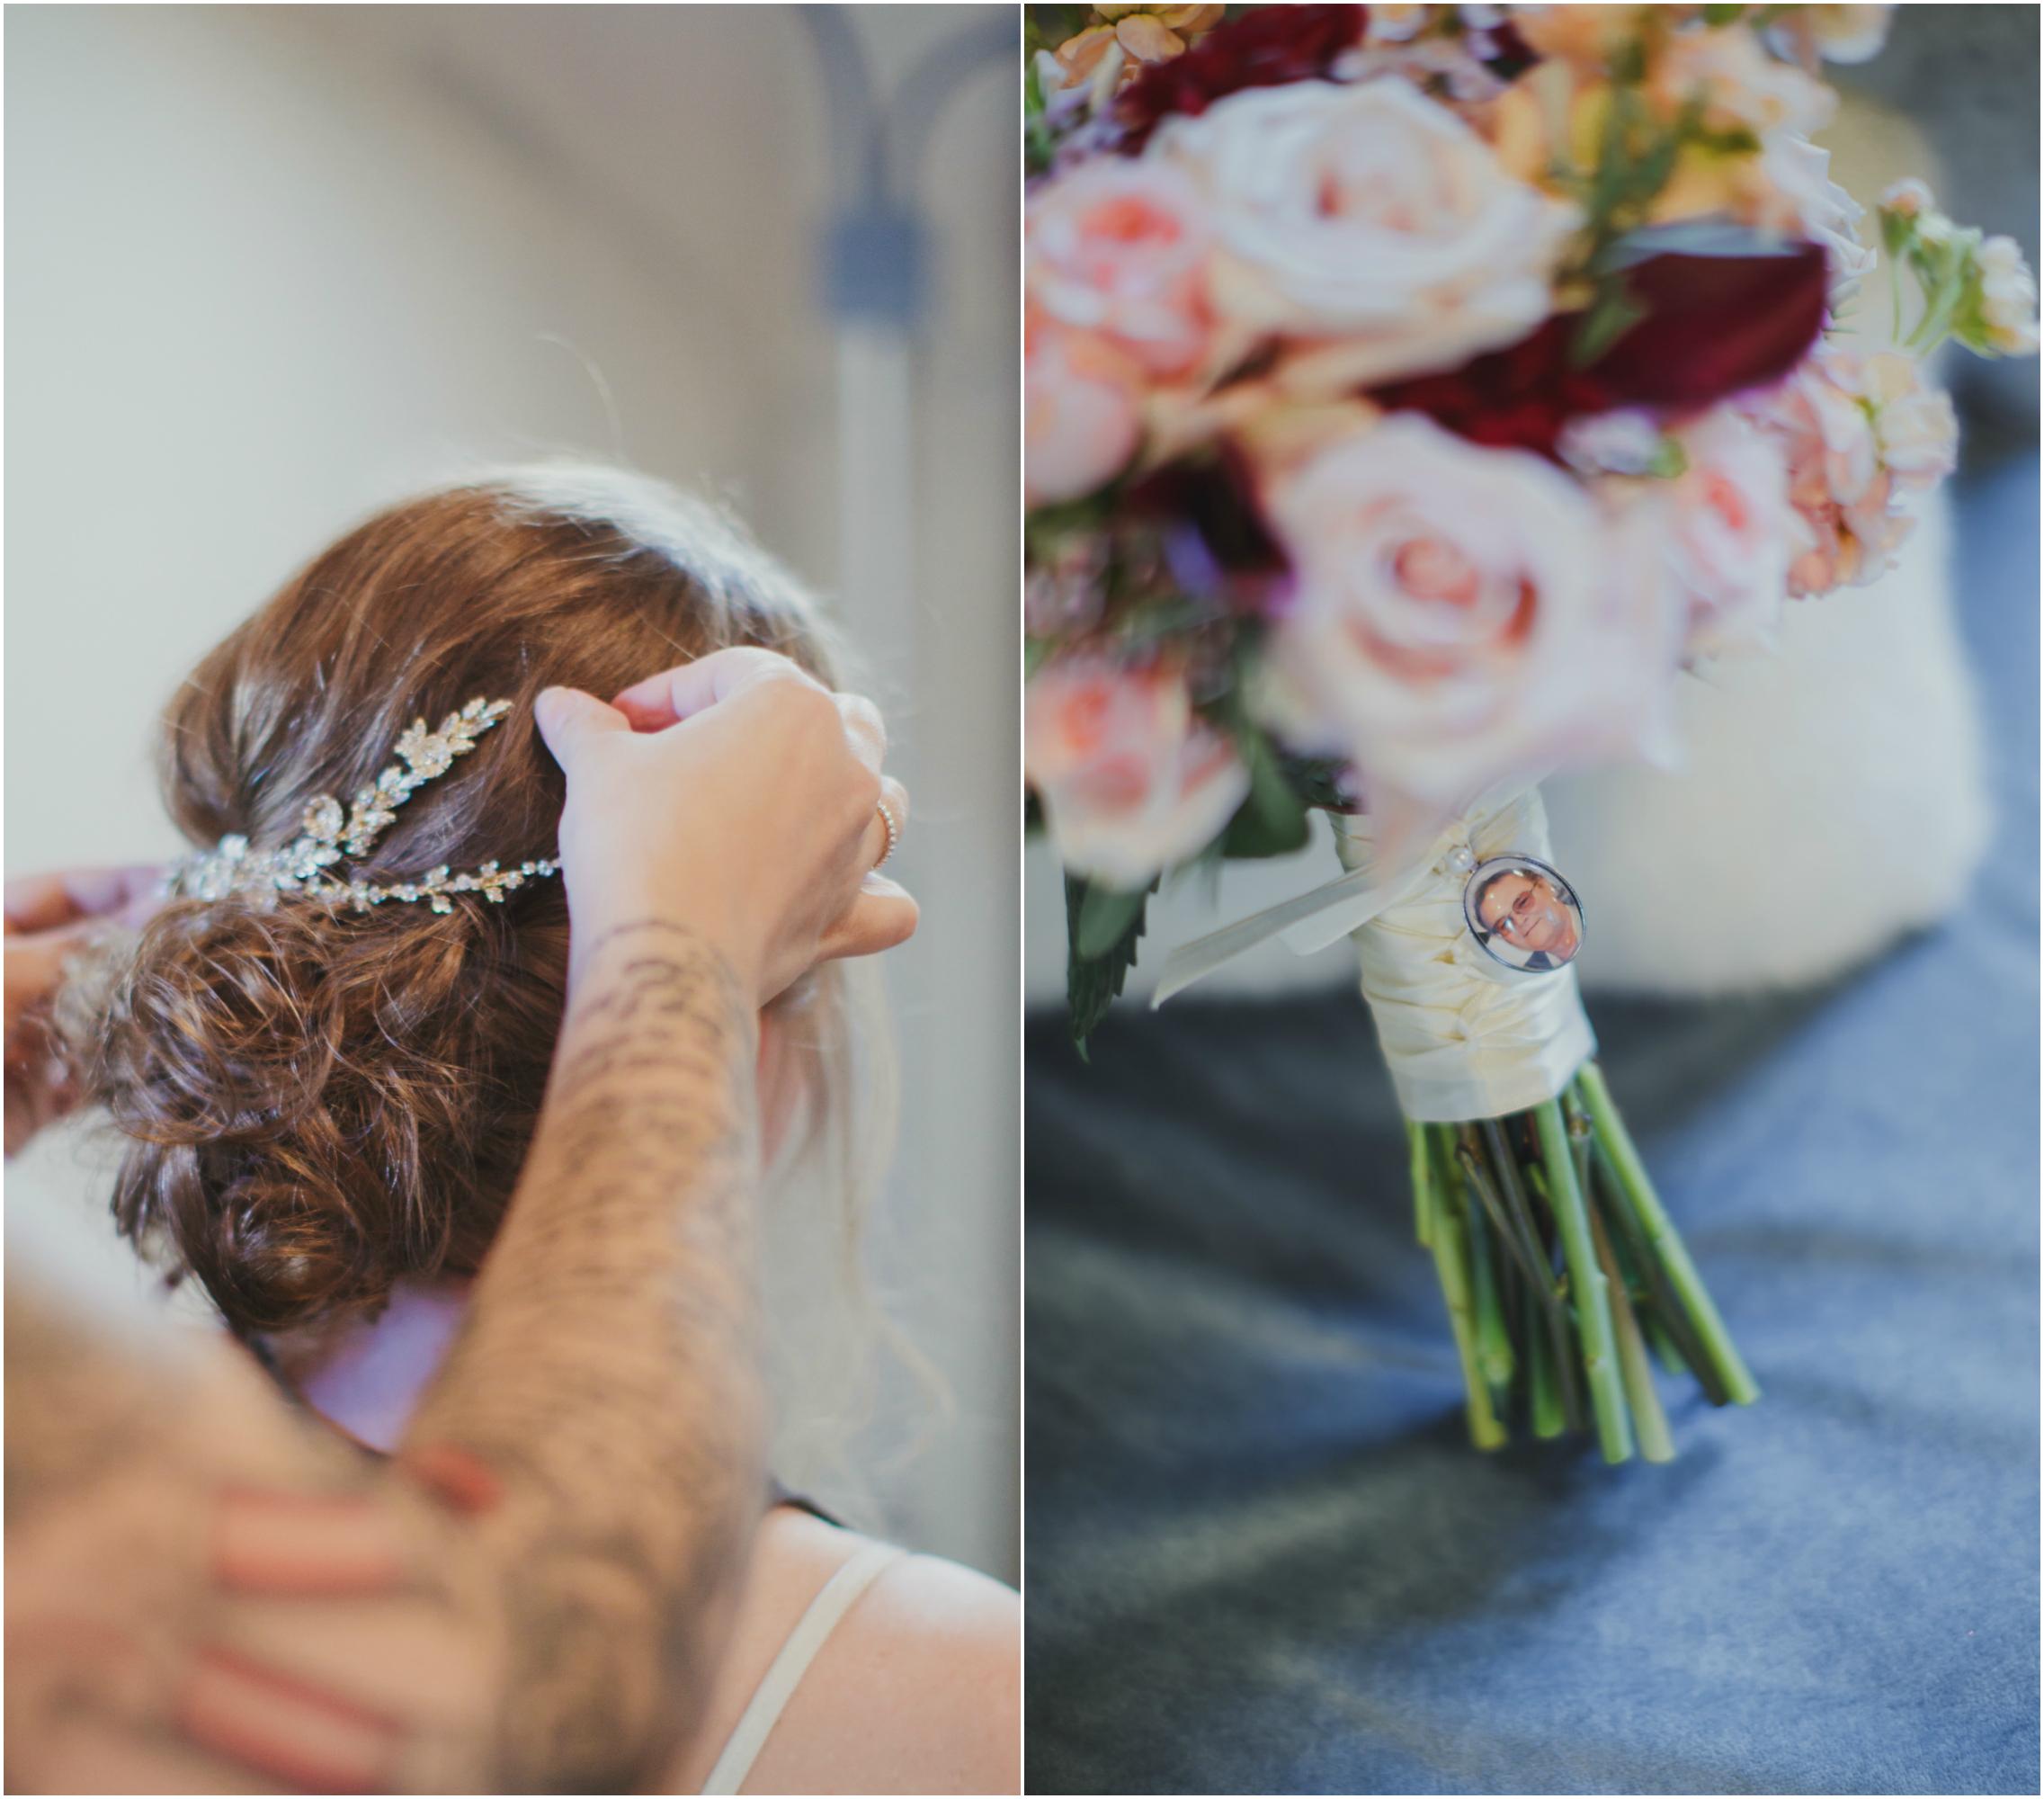 hair and flowers.jpg